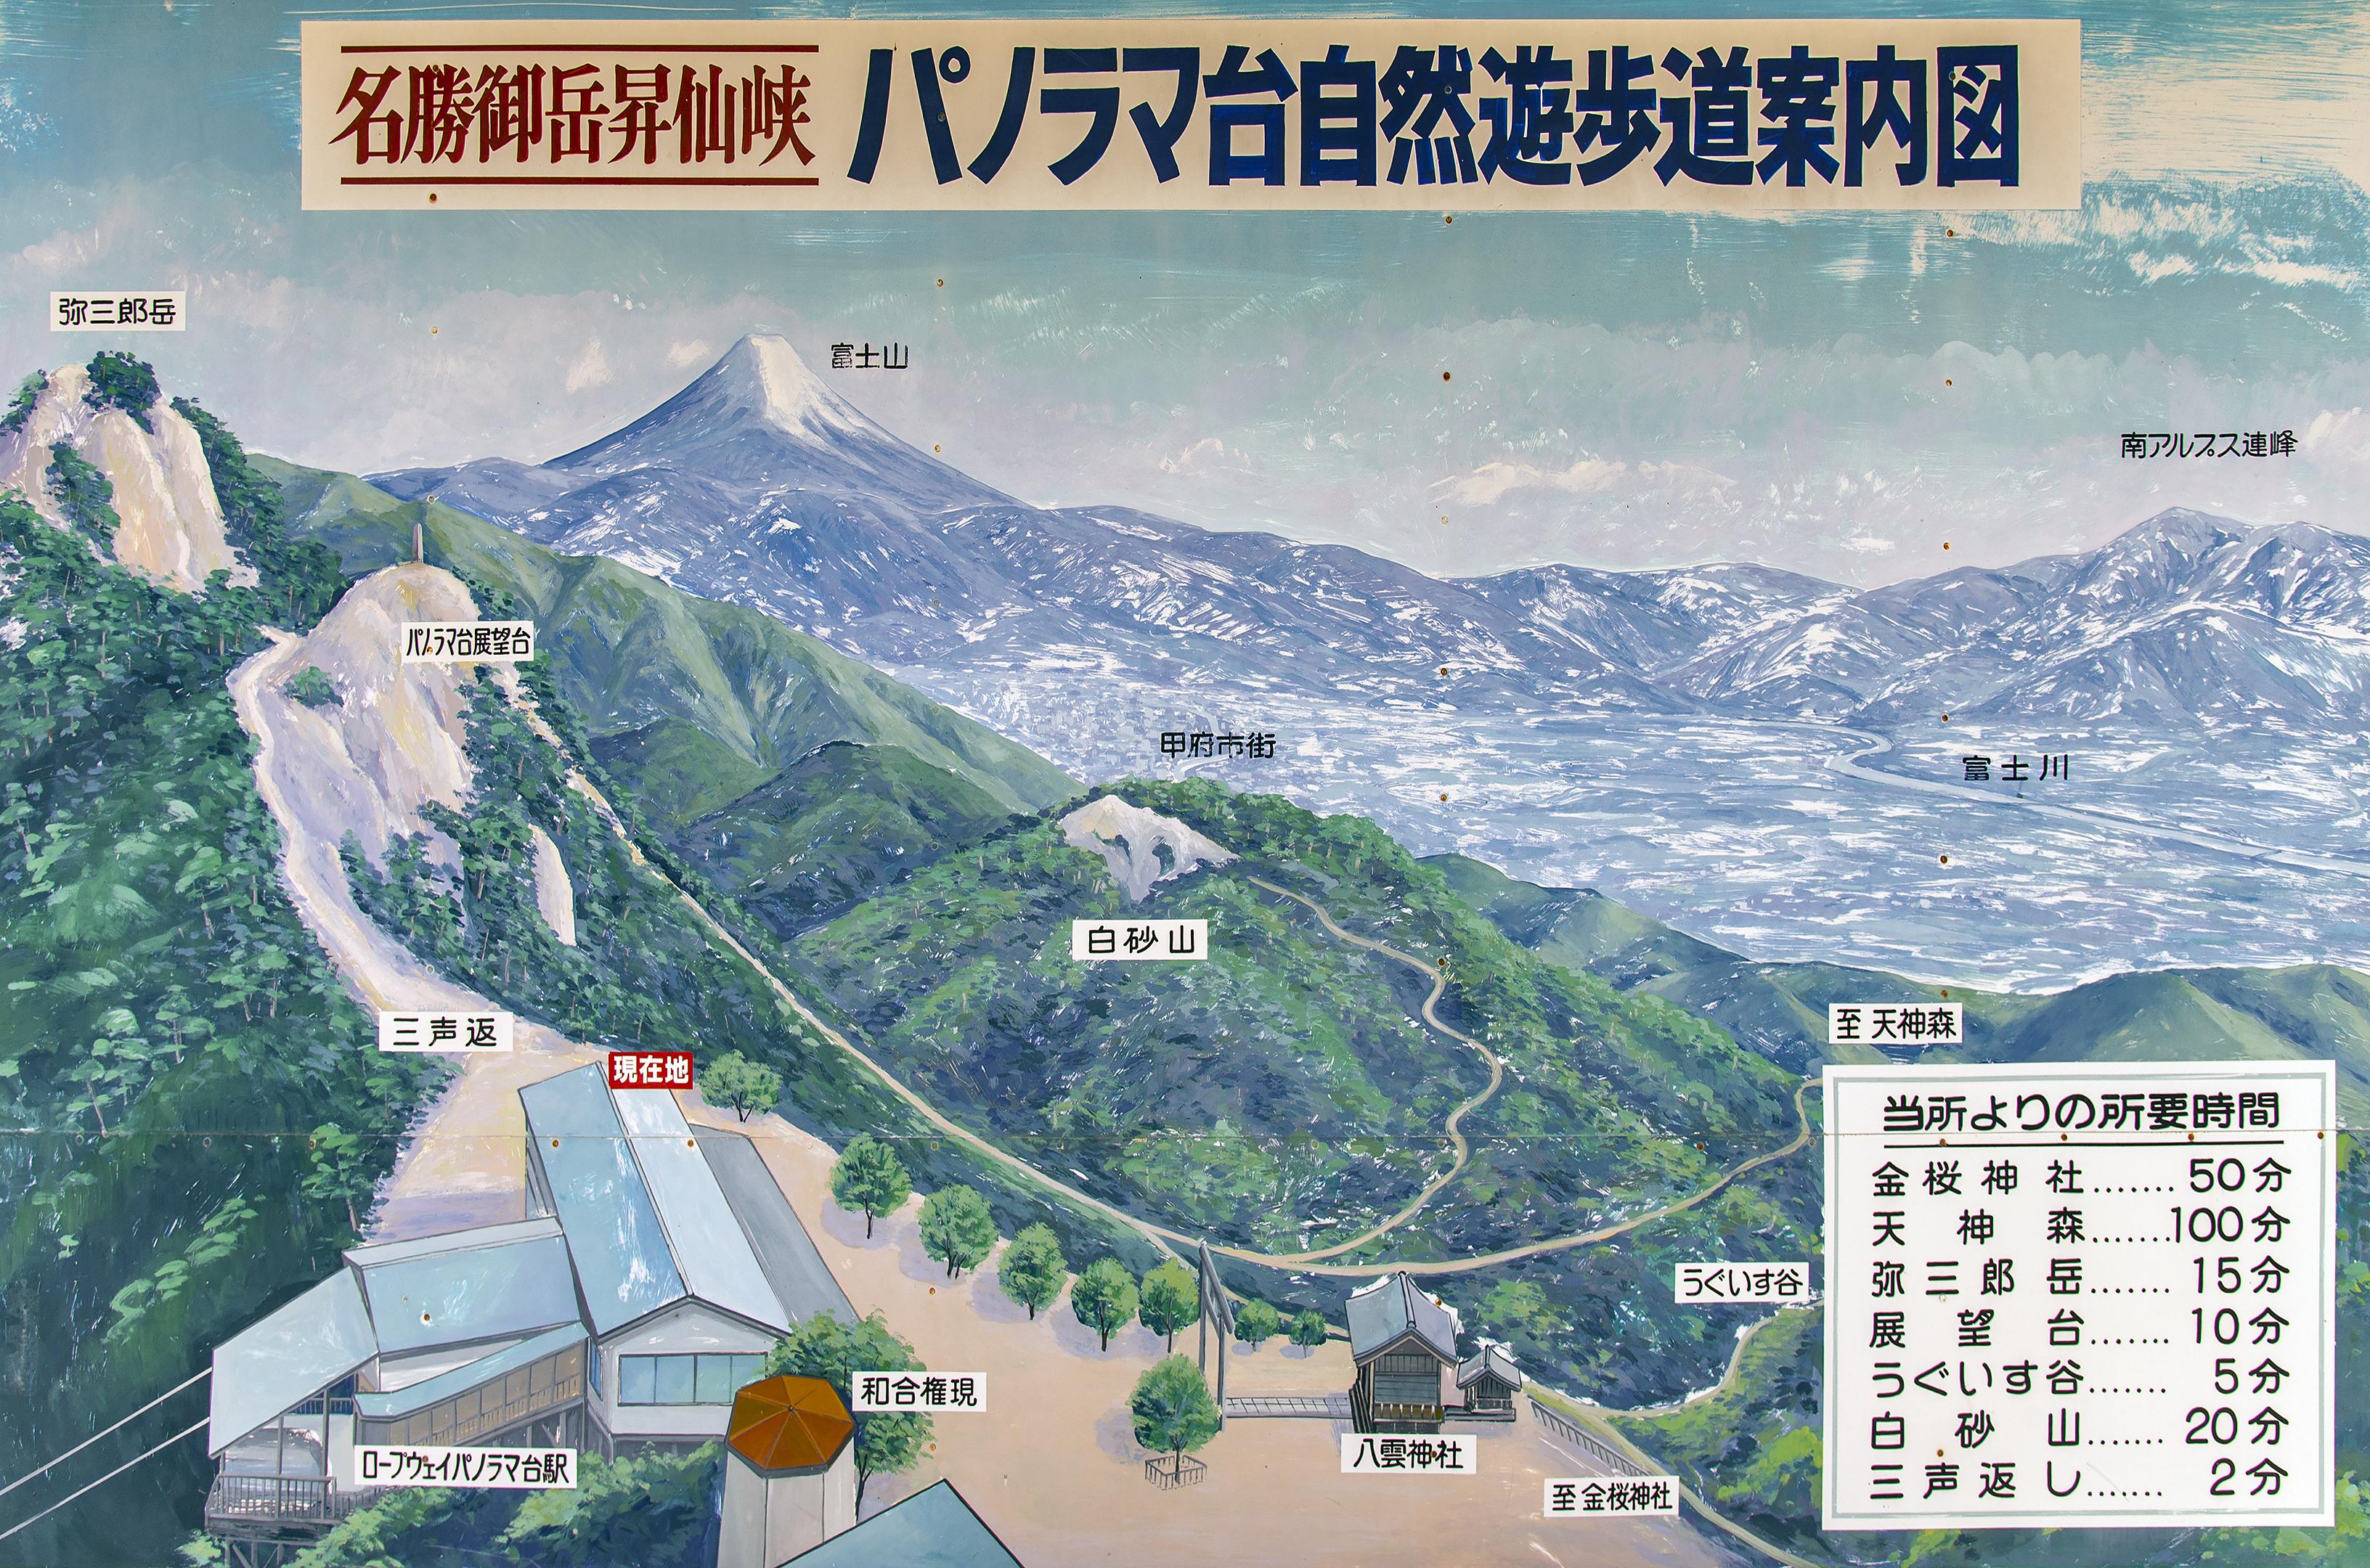 昇仙峡  map board shosenkyo